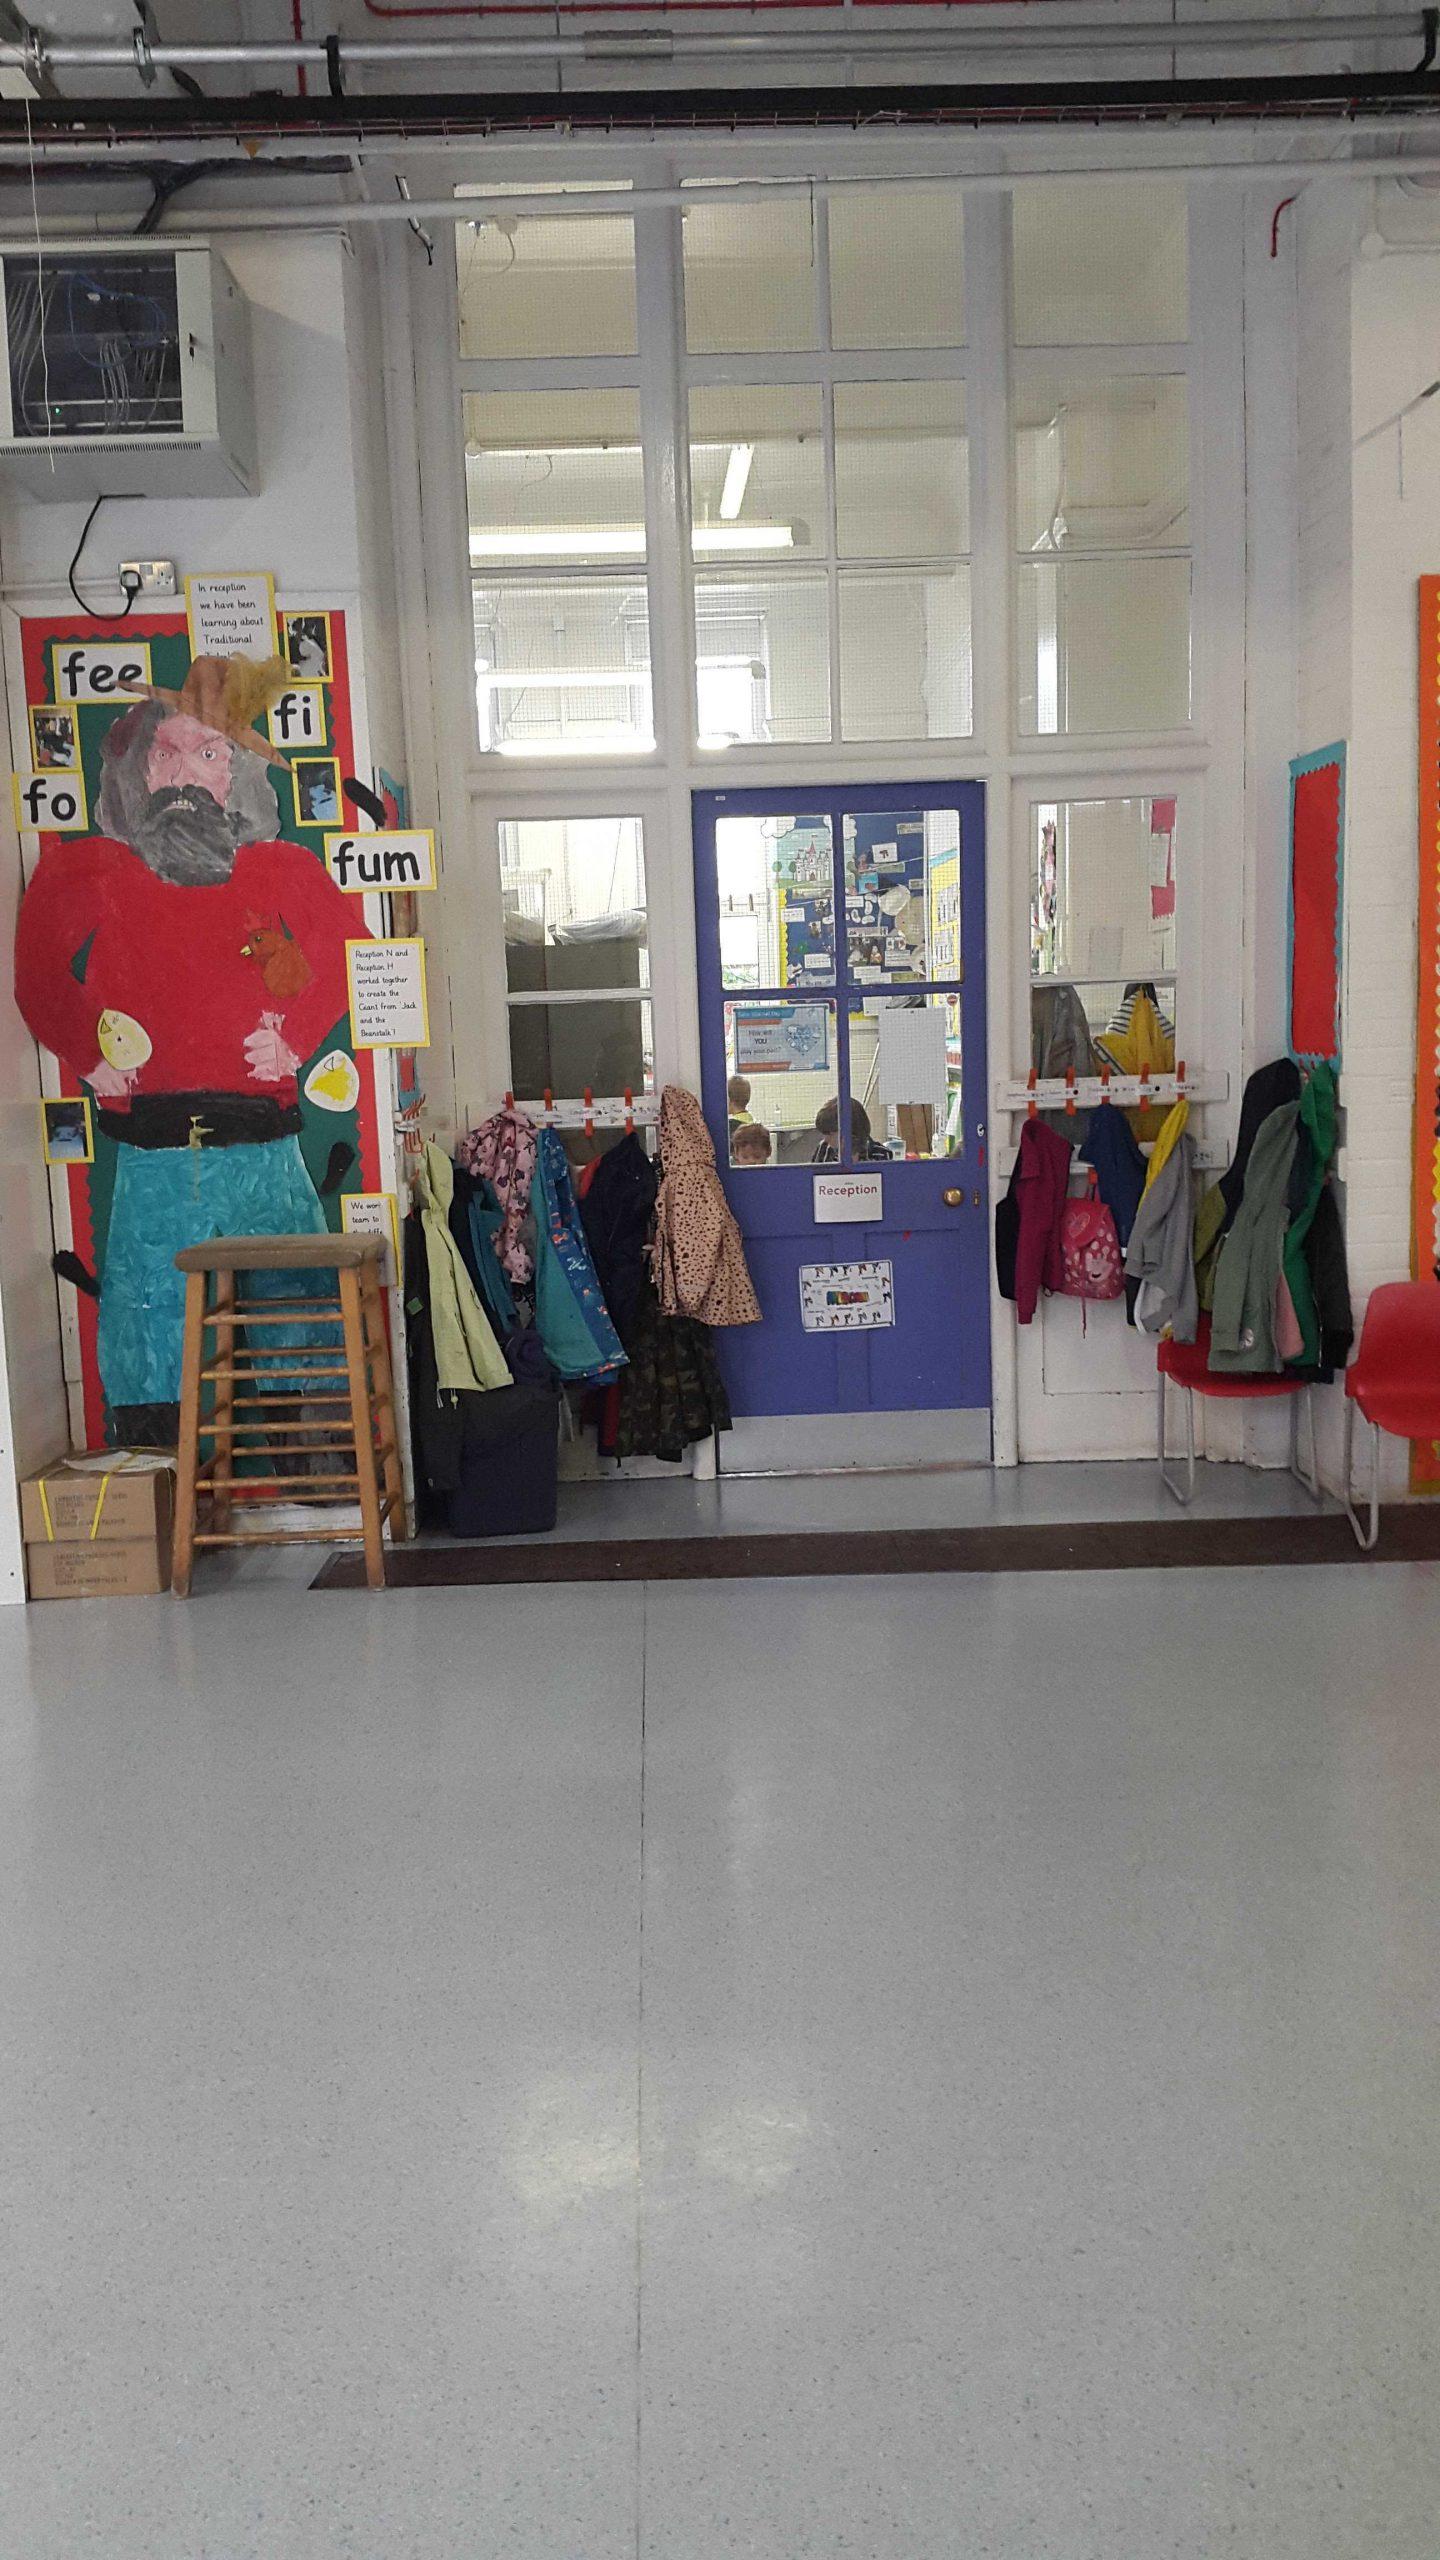 Our big adoption friendly / attachment aware school choice gamble.